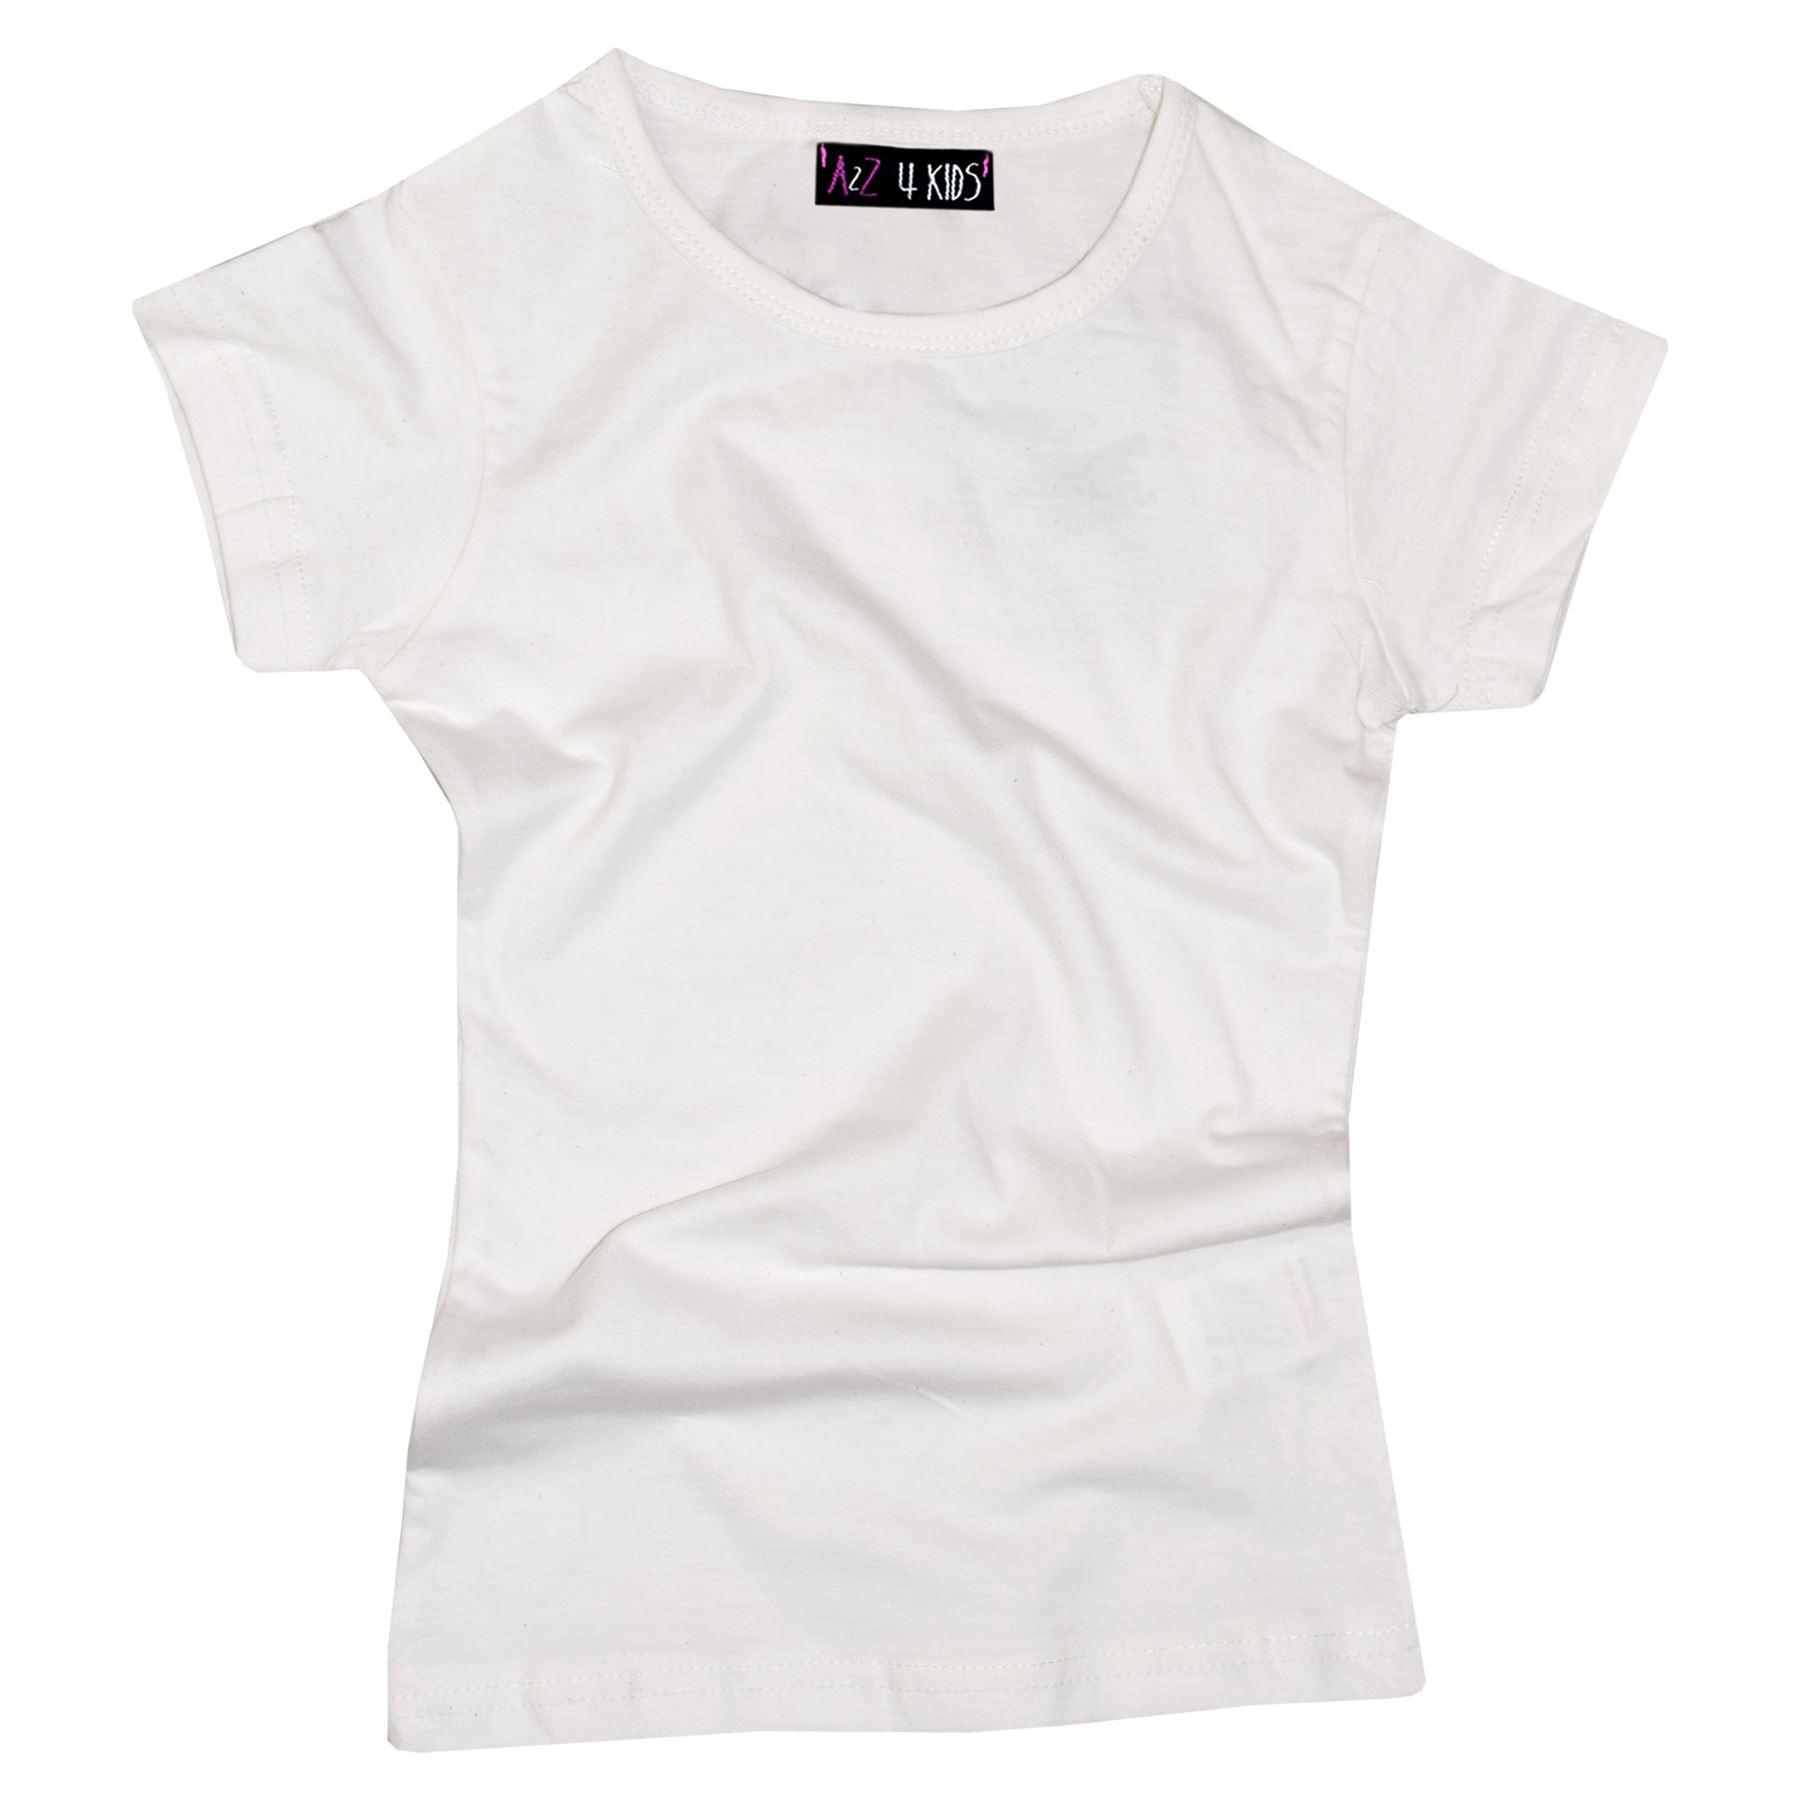 Kids-Girls-T-Shirts-Designer-100-Cotton-Plain-School-T-Shirt-Top-New-Age-3-13Yr thumbnail 38